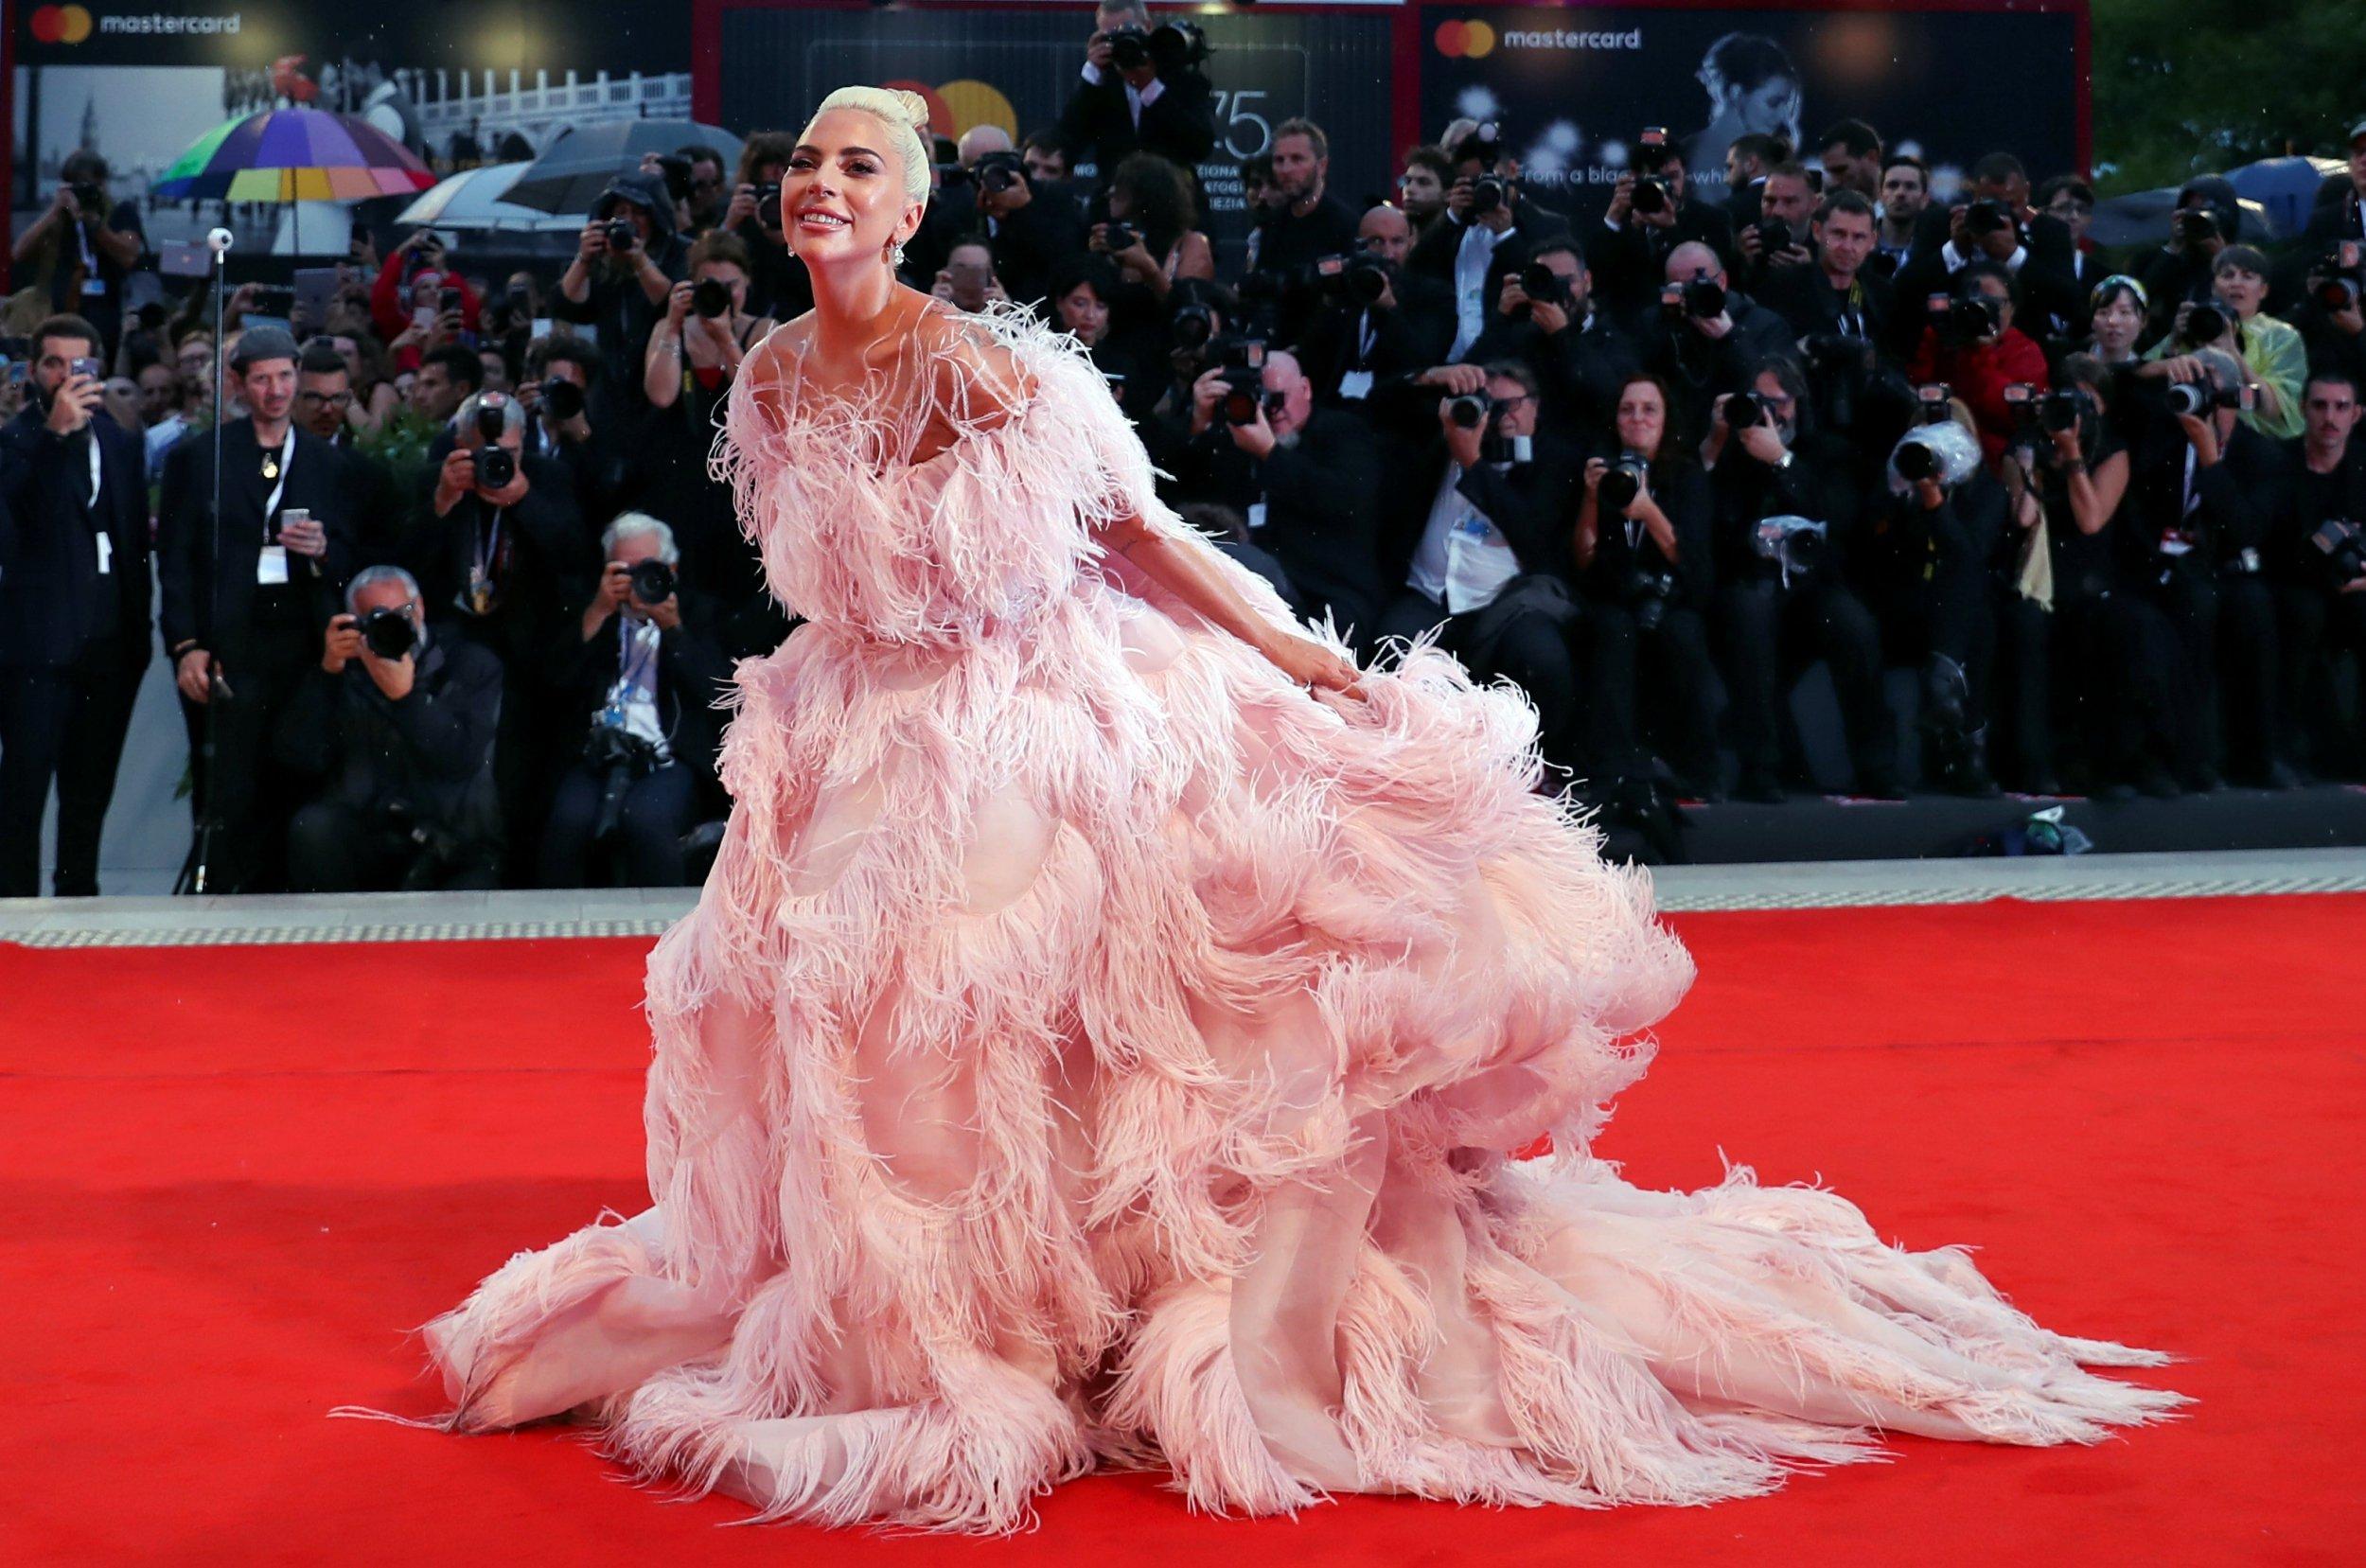 lady-gaga-red-carpet-style-rave.jpg